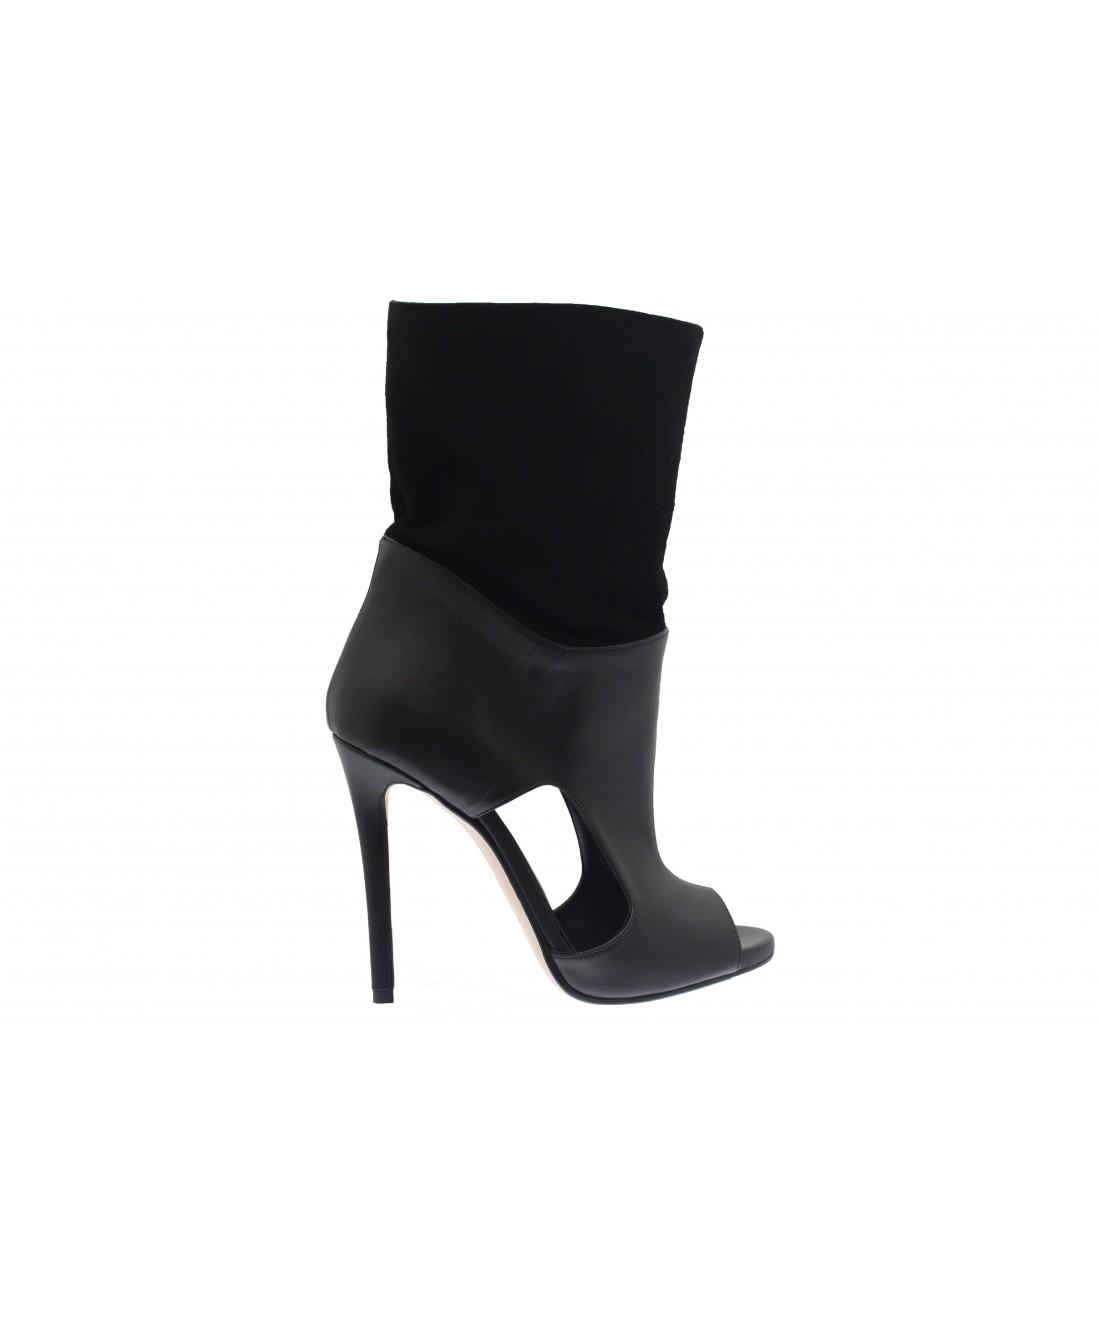 nouvelle dition black panther bottine talon couture. Black Bedroom Furniture Sets. Home Design Ideas